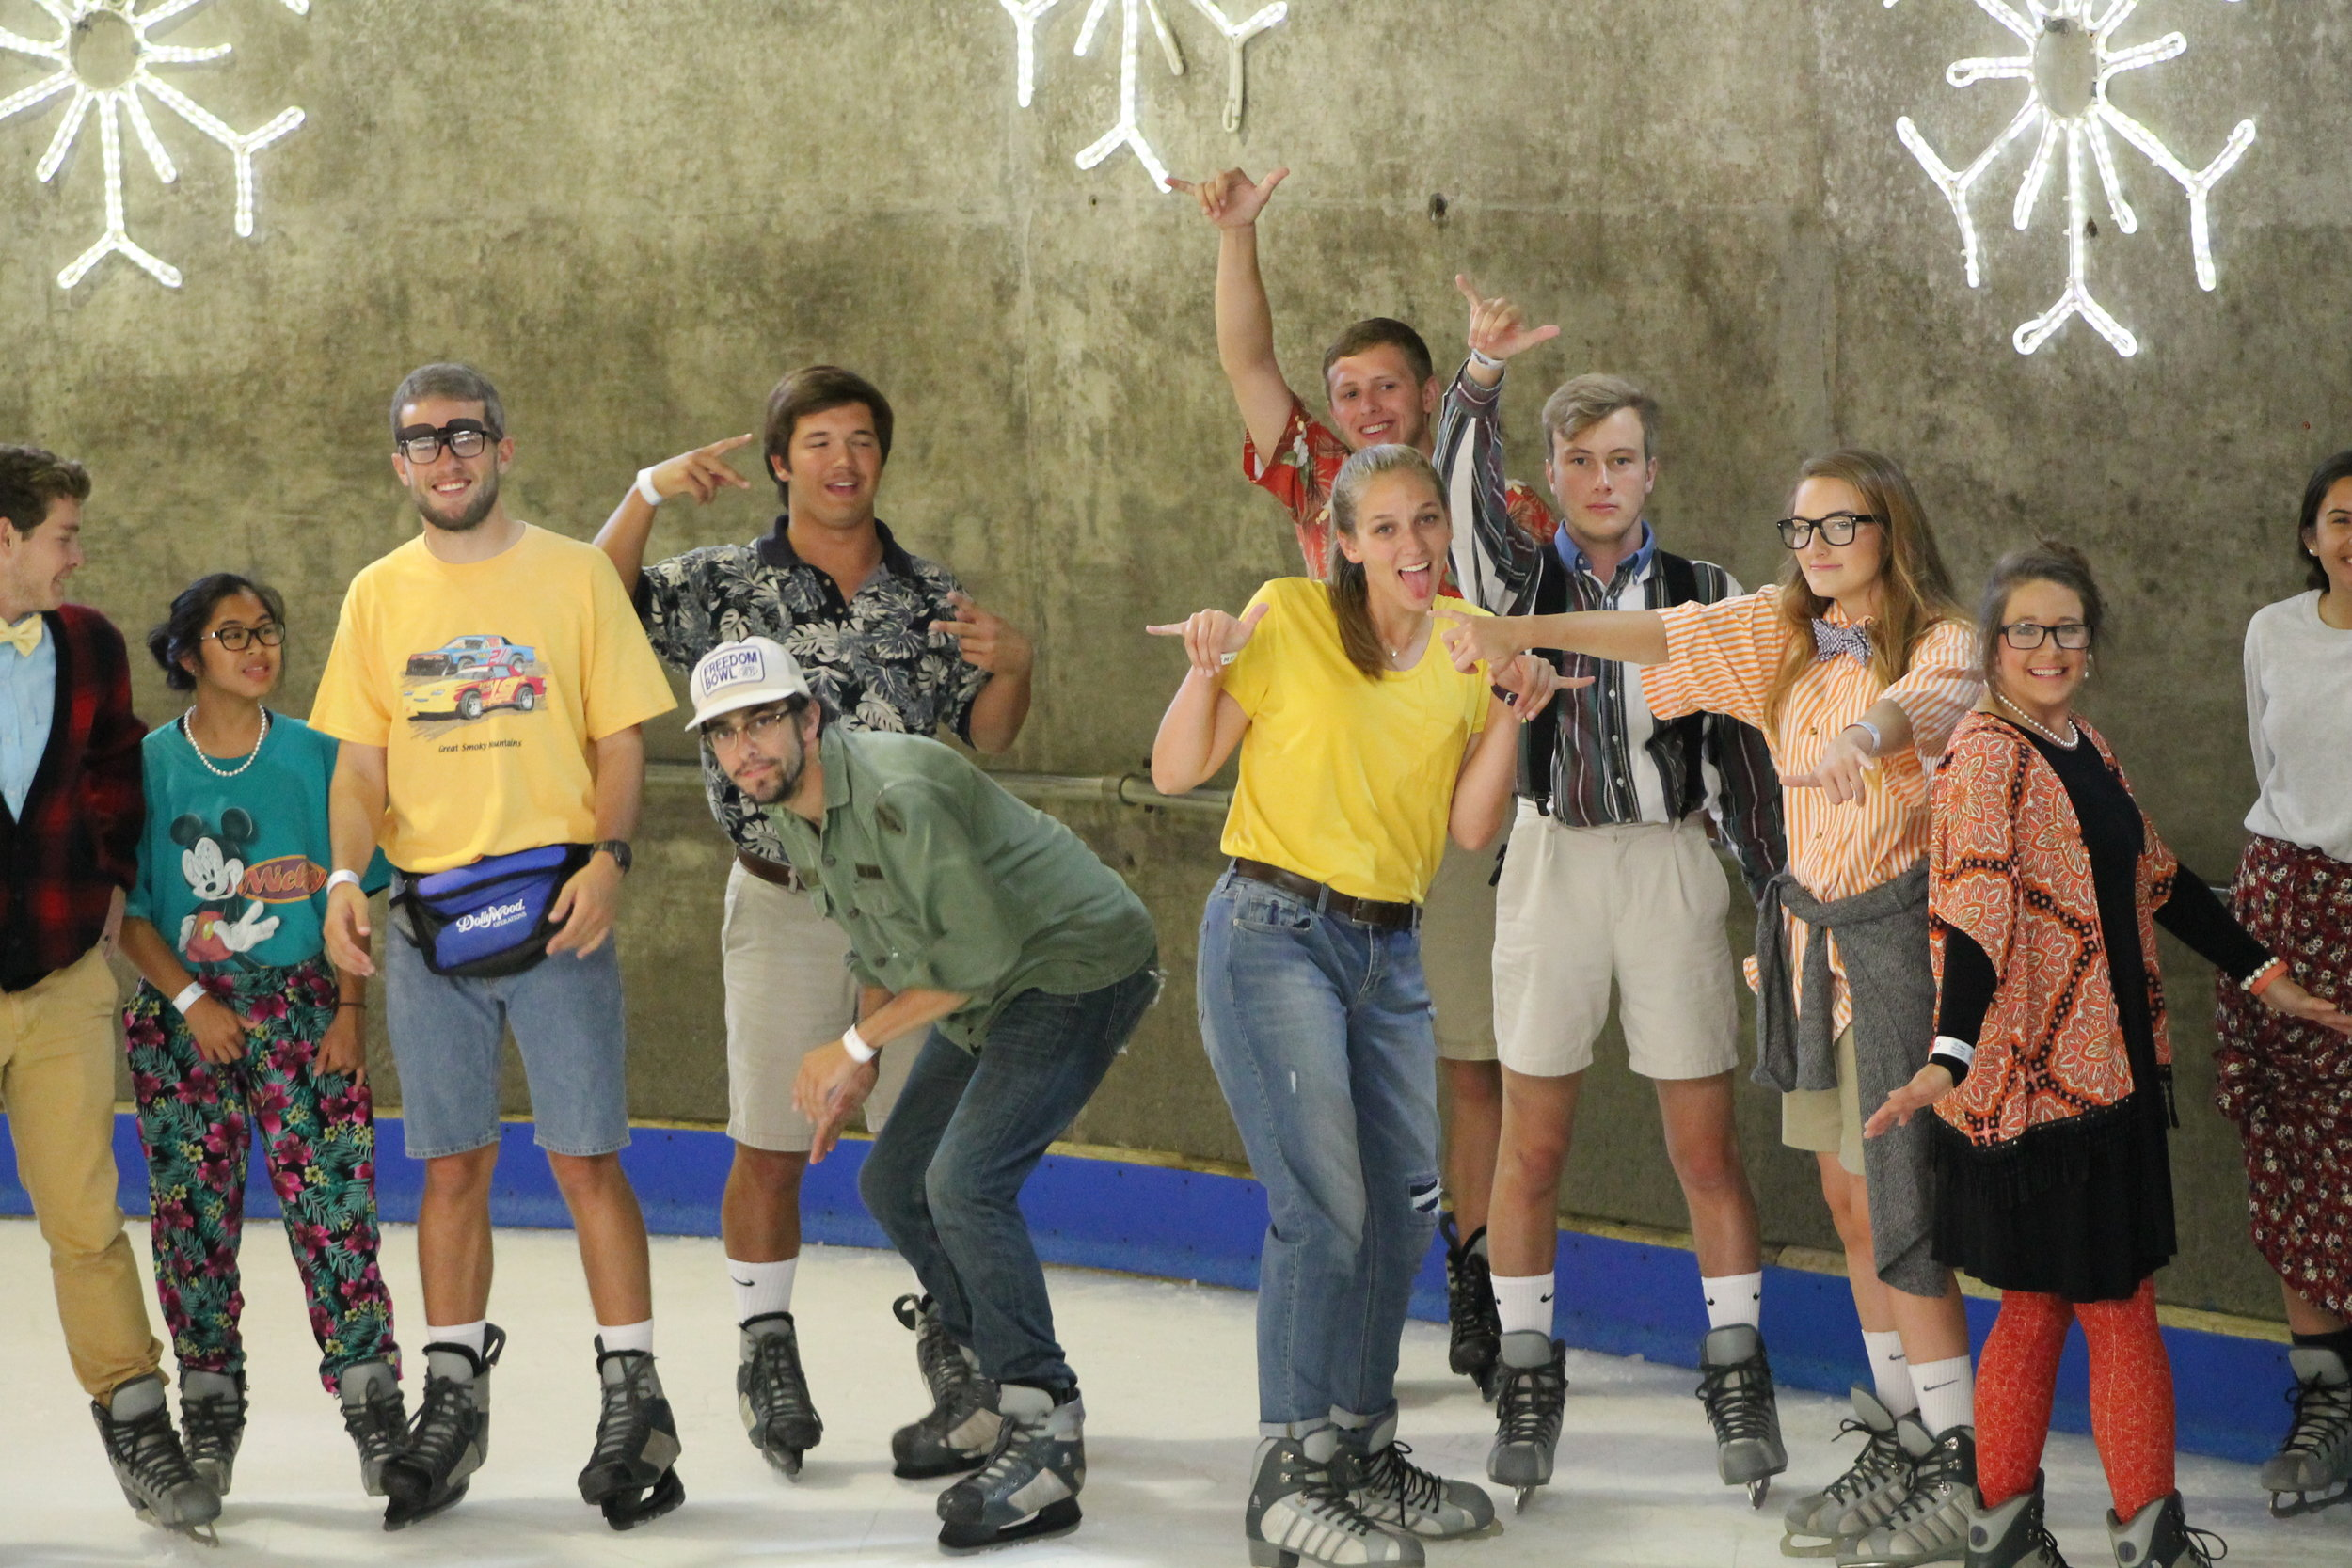 skating_fun.JPG